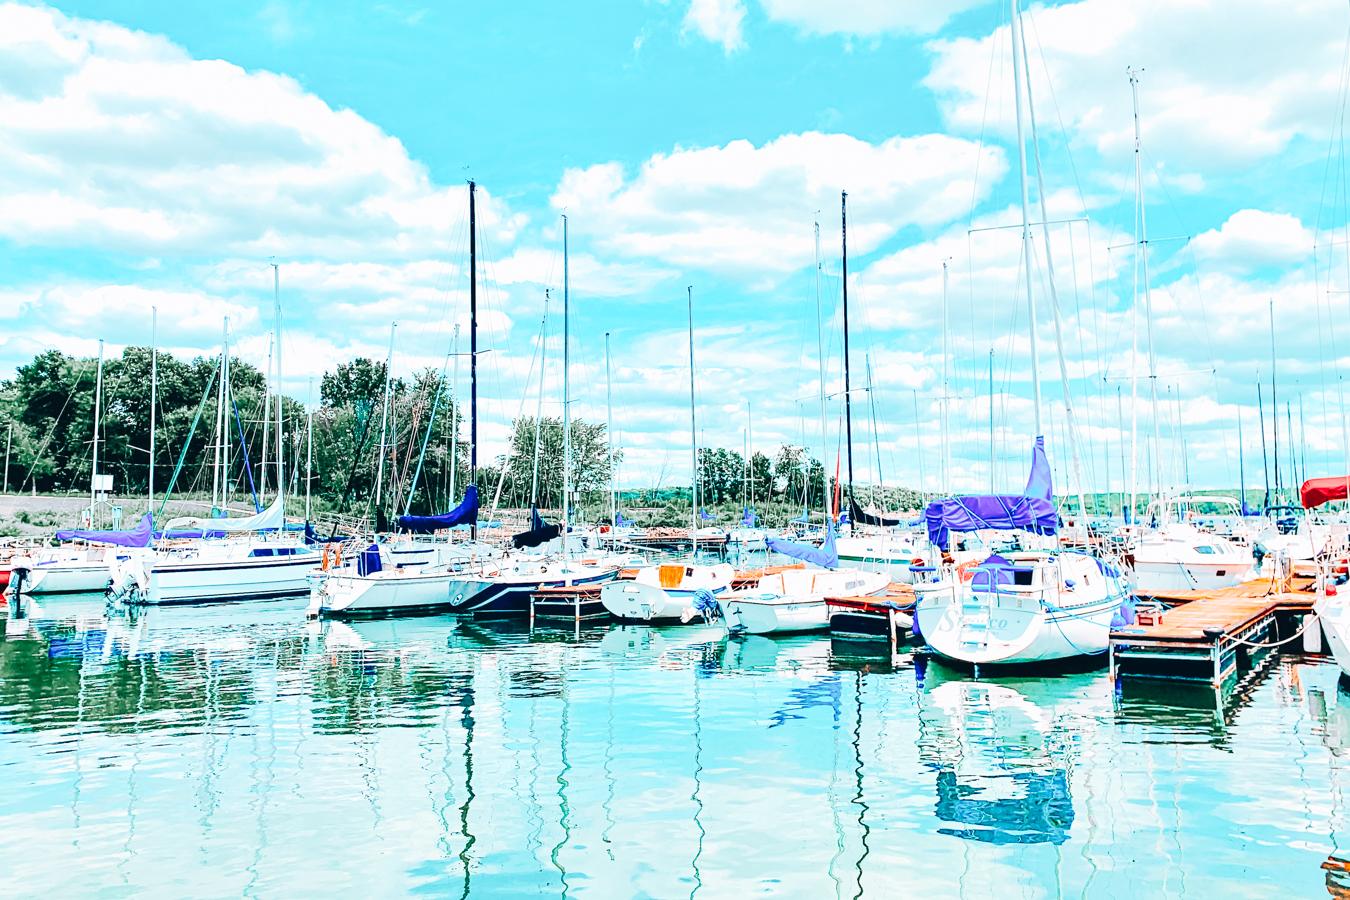 Boats in Stockton